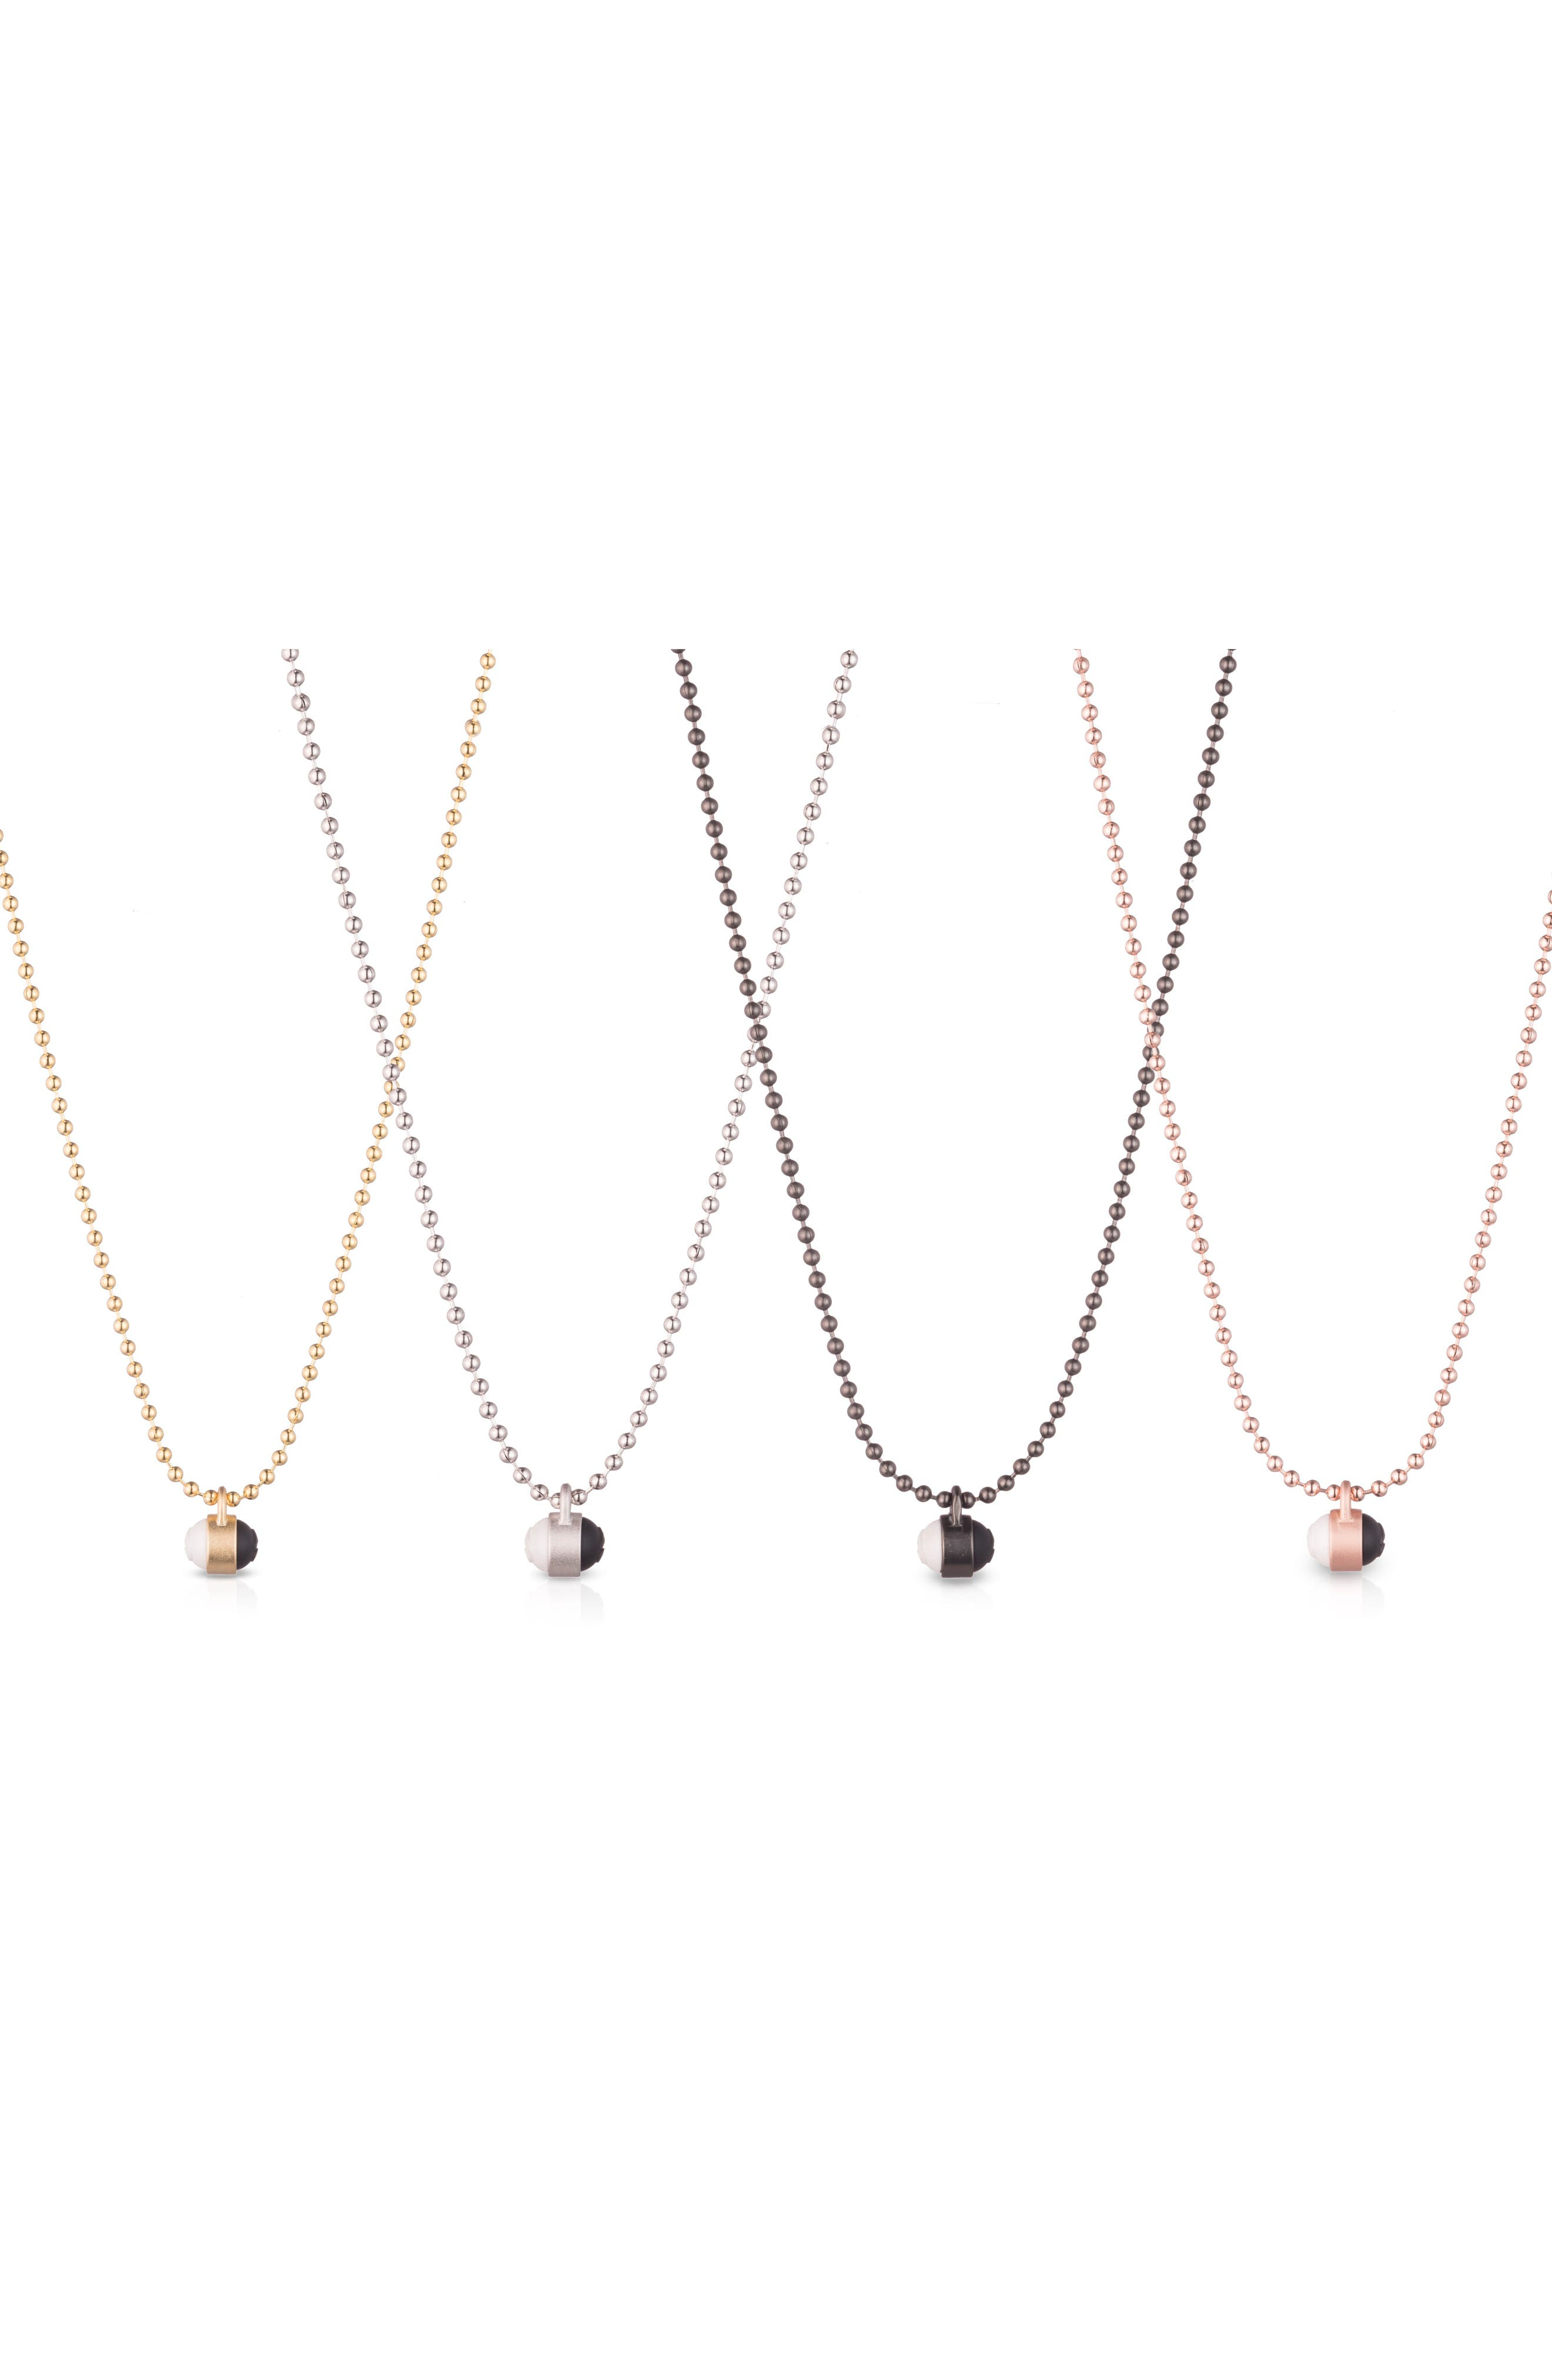 Pendant Ball Chain Necklace,                             Alternate thumbnail 15, color,